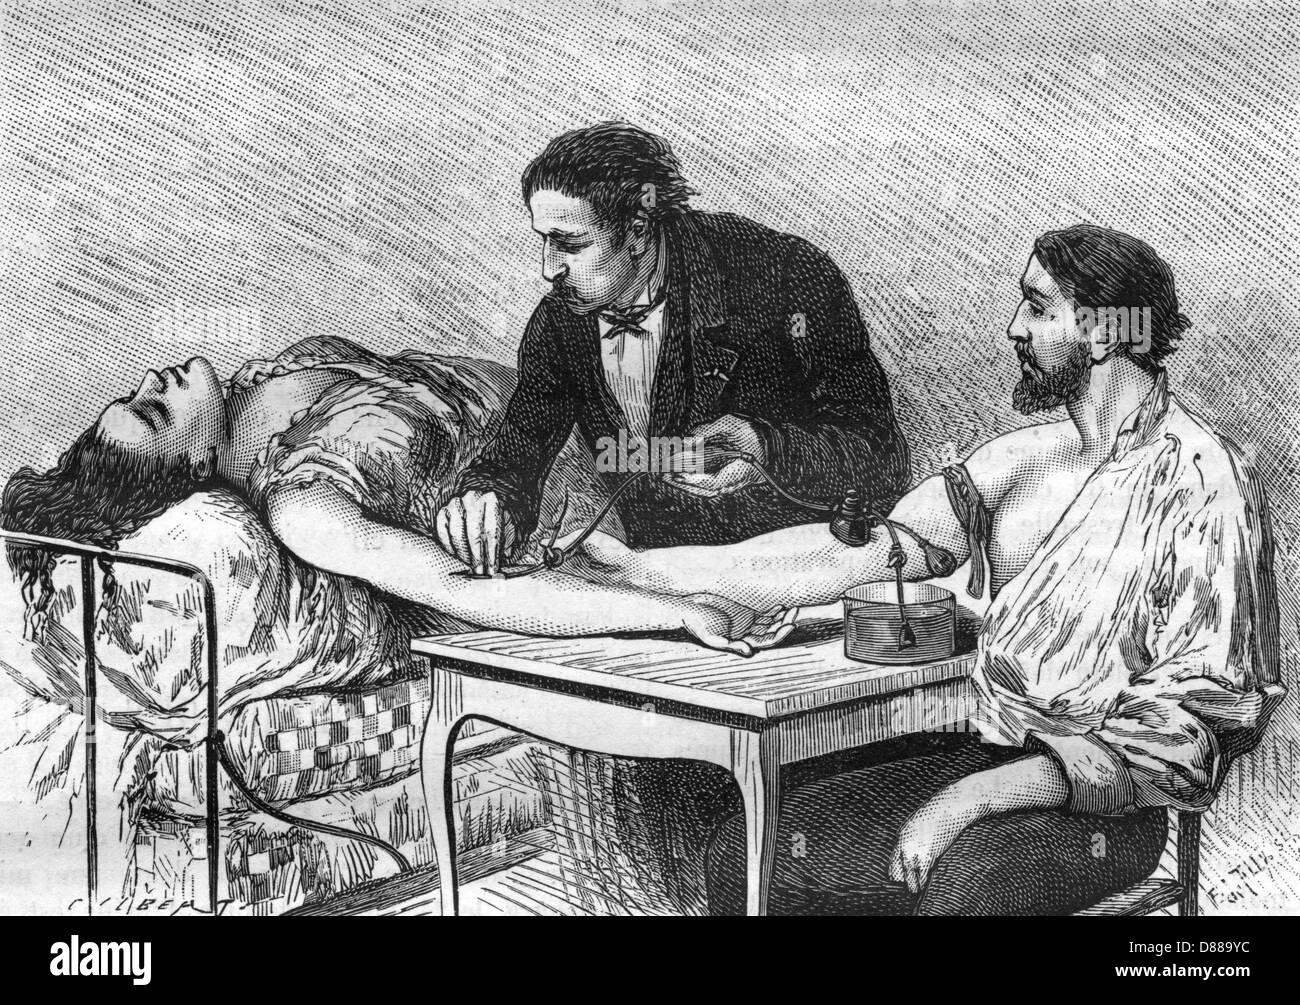 Blood Transfusion 1882 - Stock Image